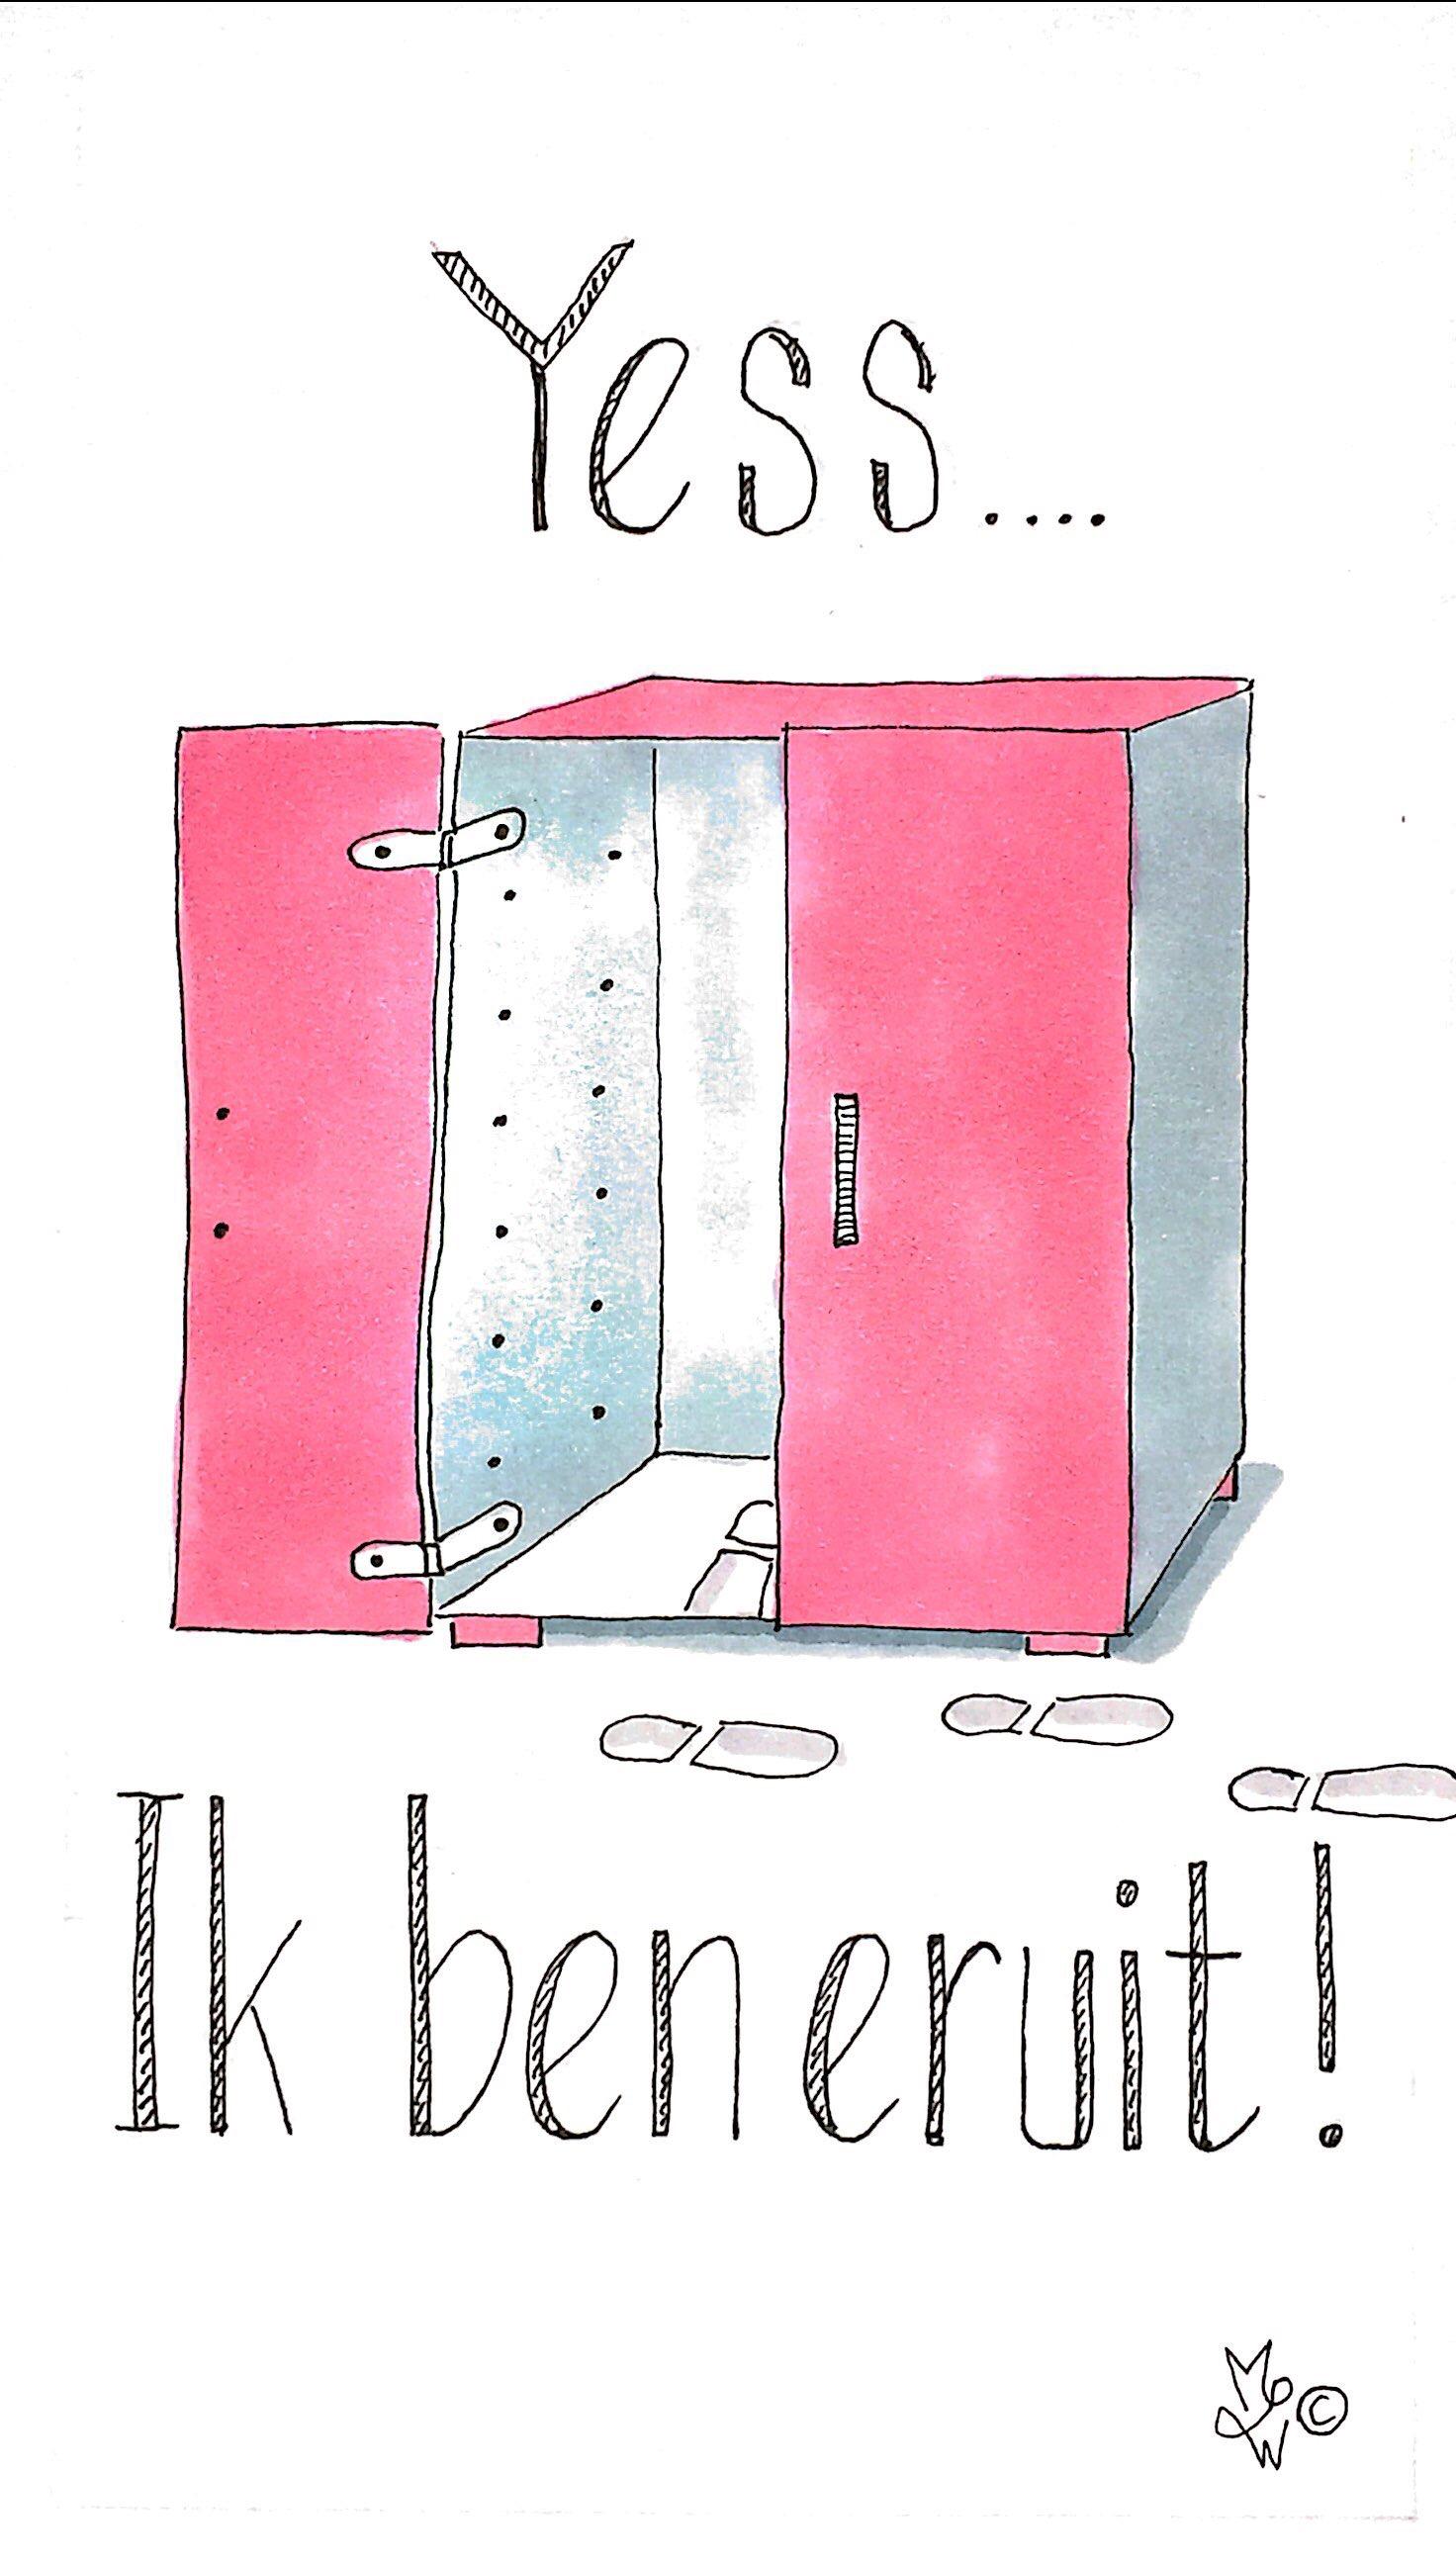 Wenskaart uit roze kast.